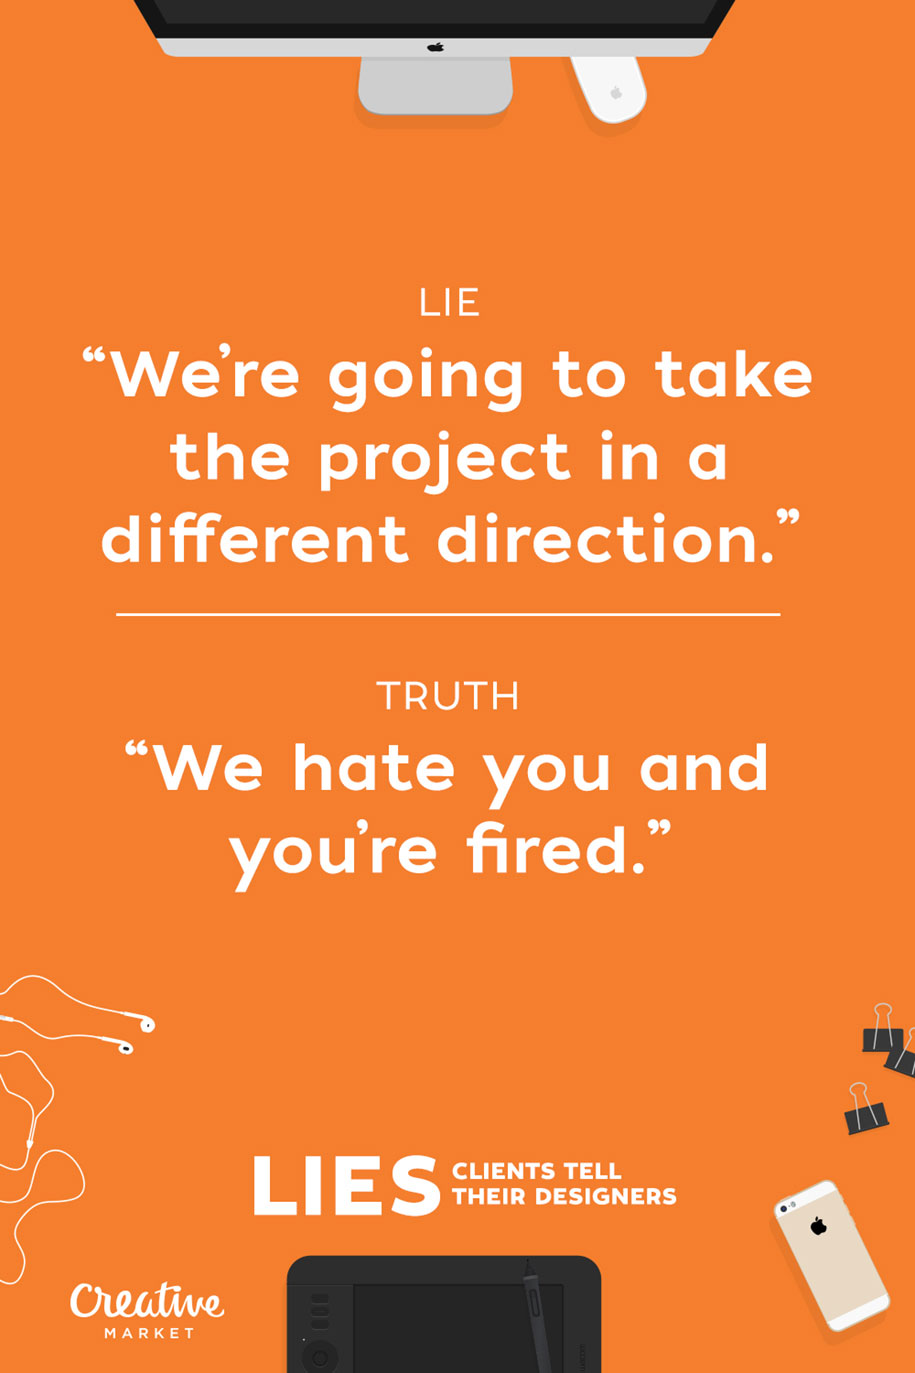 15-lies-clients-tell-designers-joshua-johnson-creative-market-13